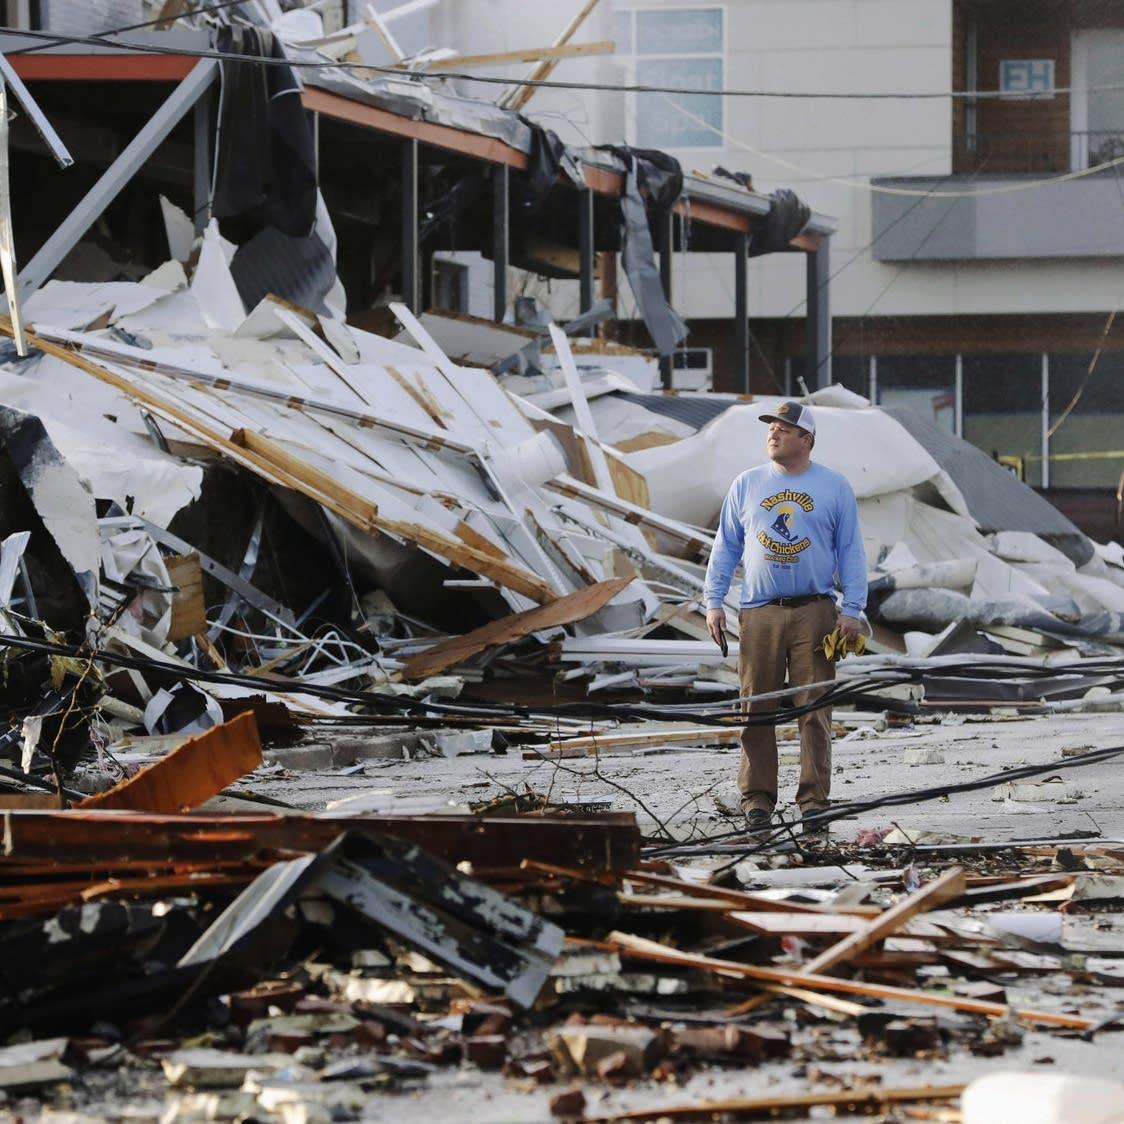 A man surveys tornado damage in Nashville on March 3, 2020